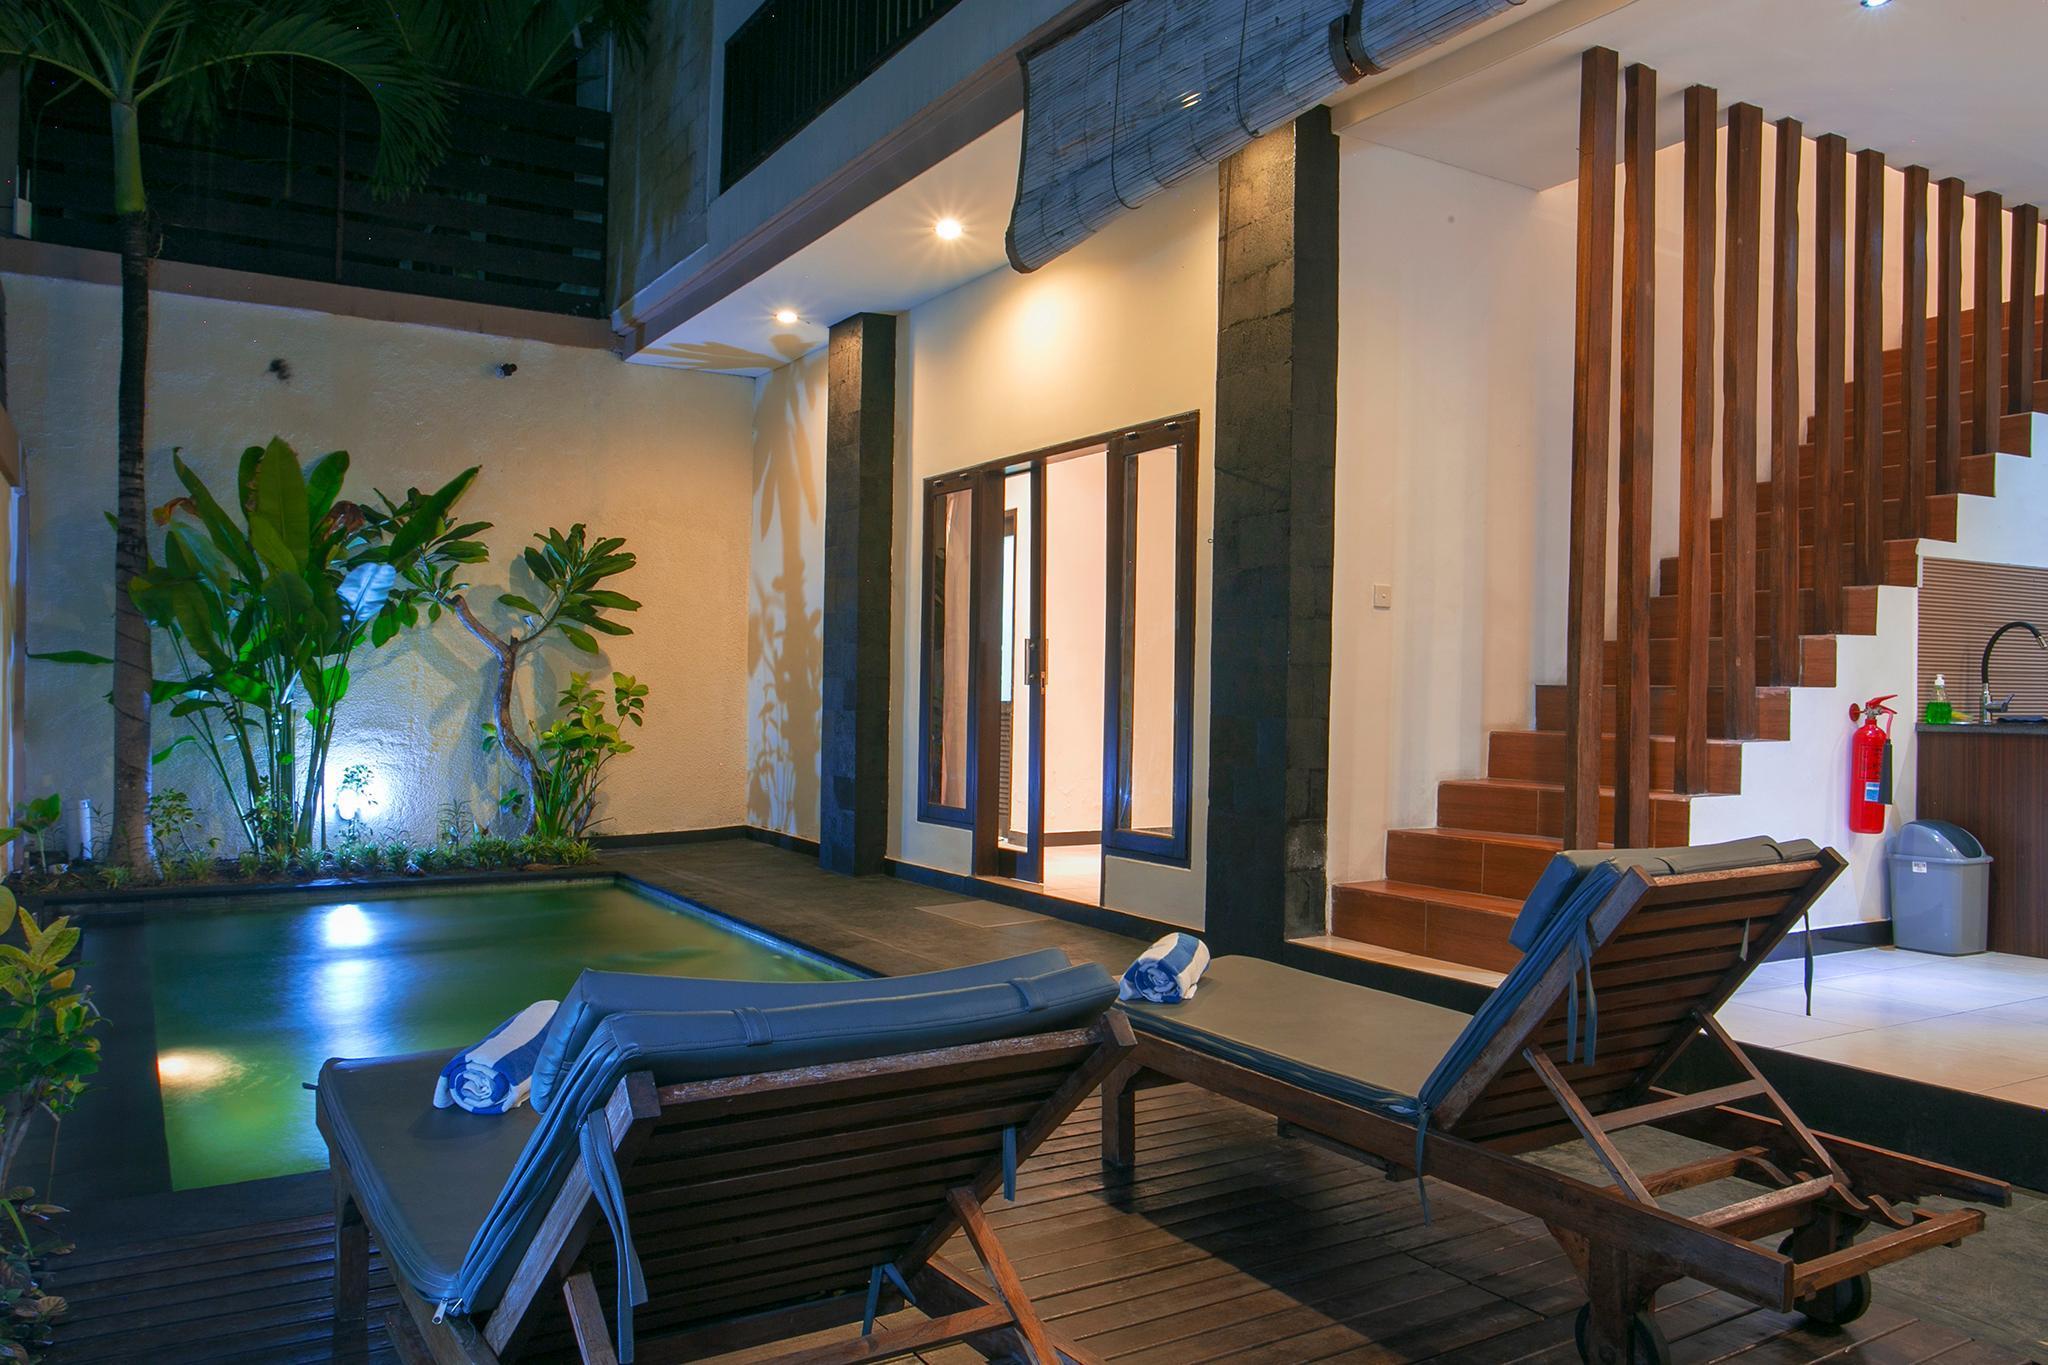 Luxury Villa For Honeymoon And Relax